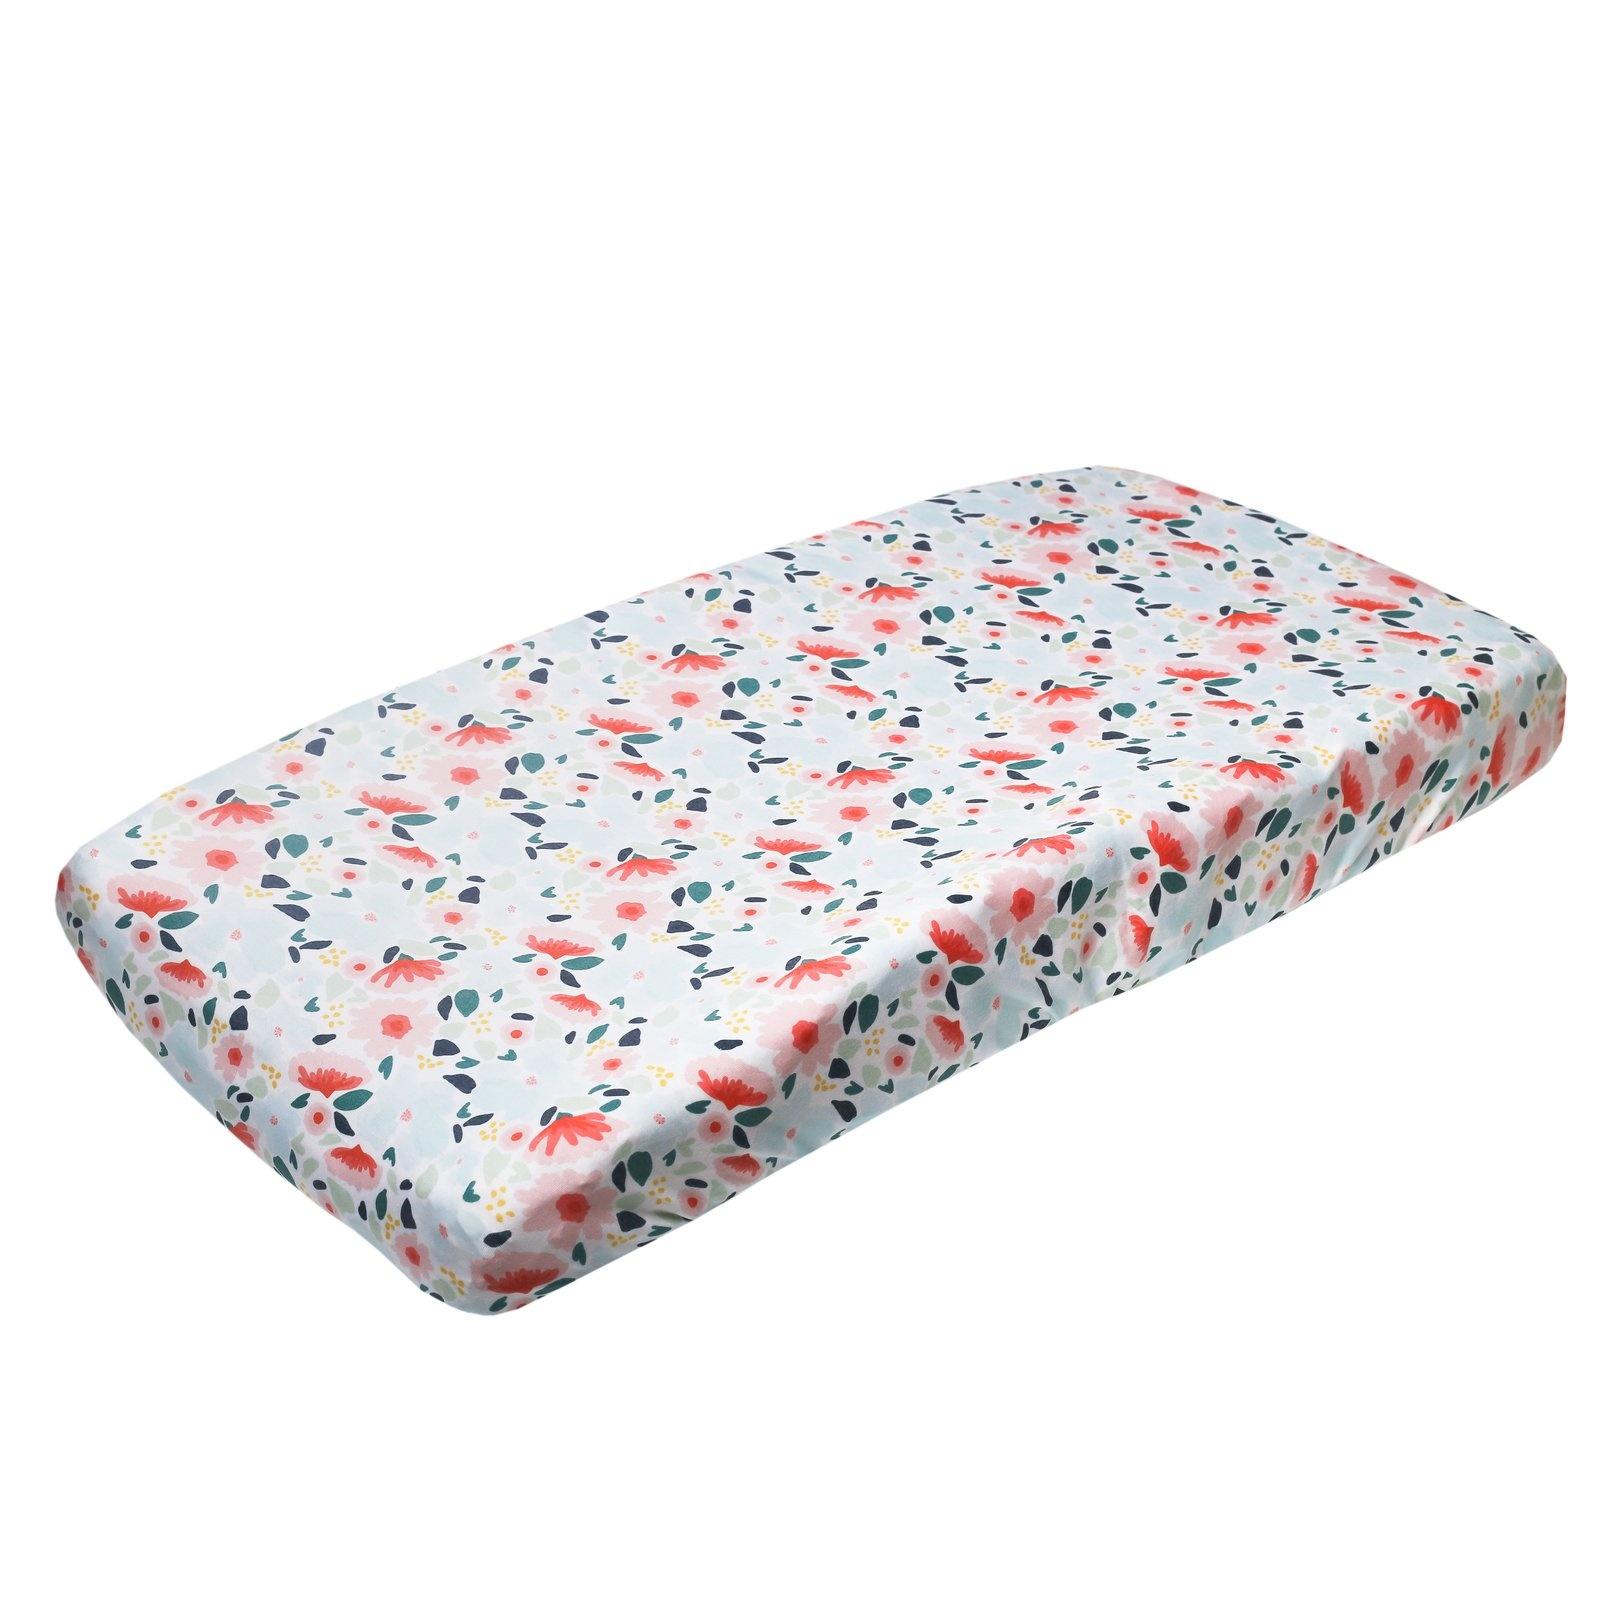 Copper Pearl Premium Diaper Changing Pad Cover Leilani